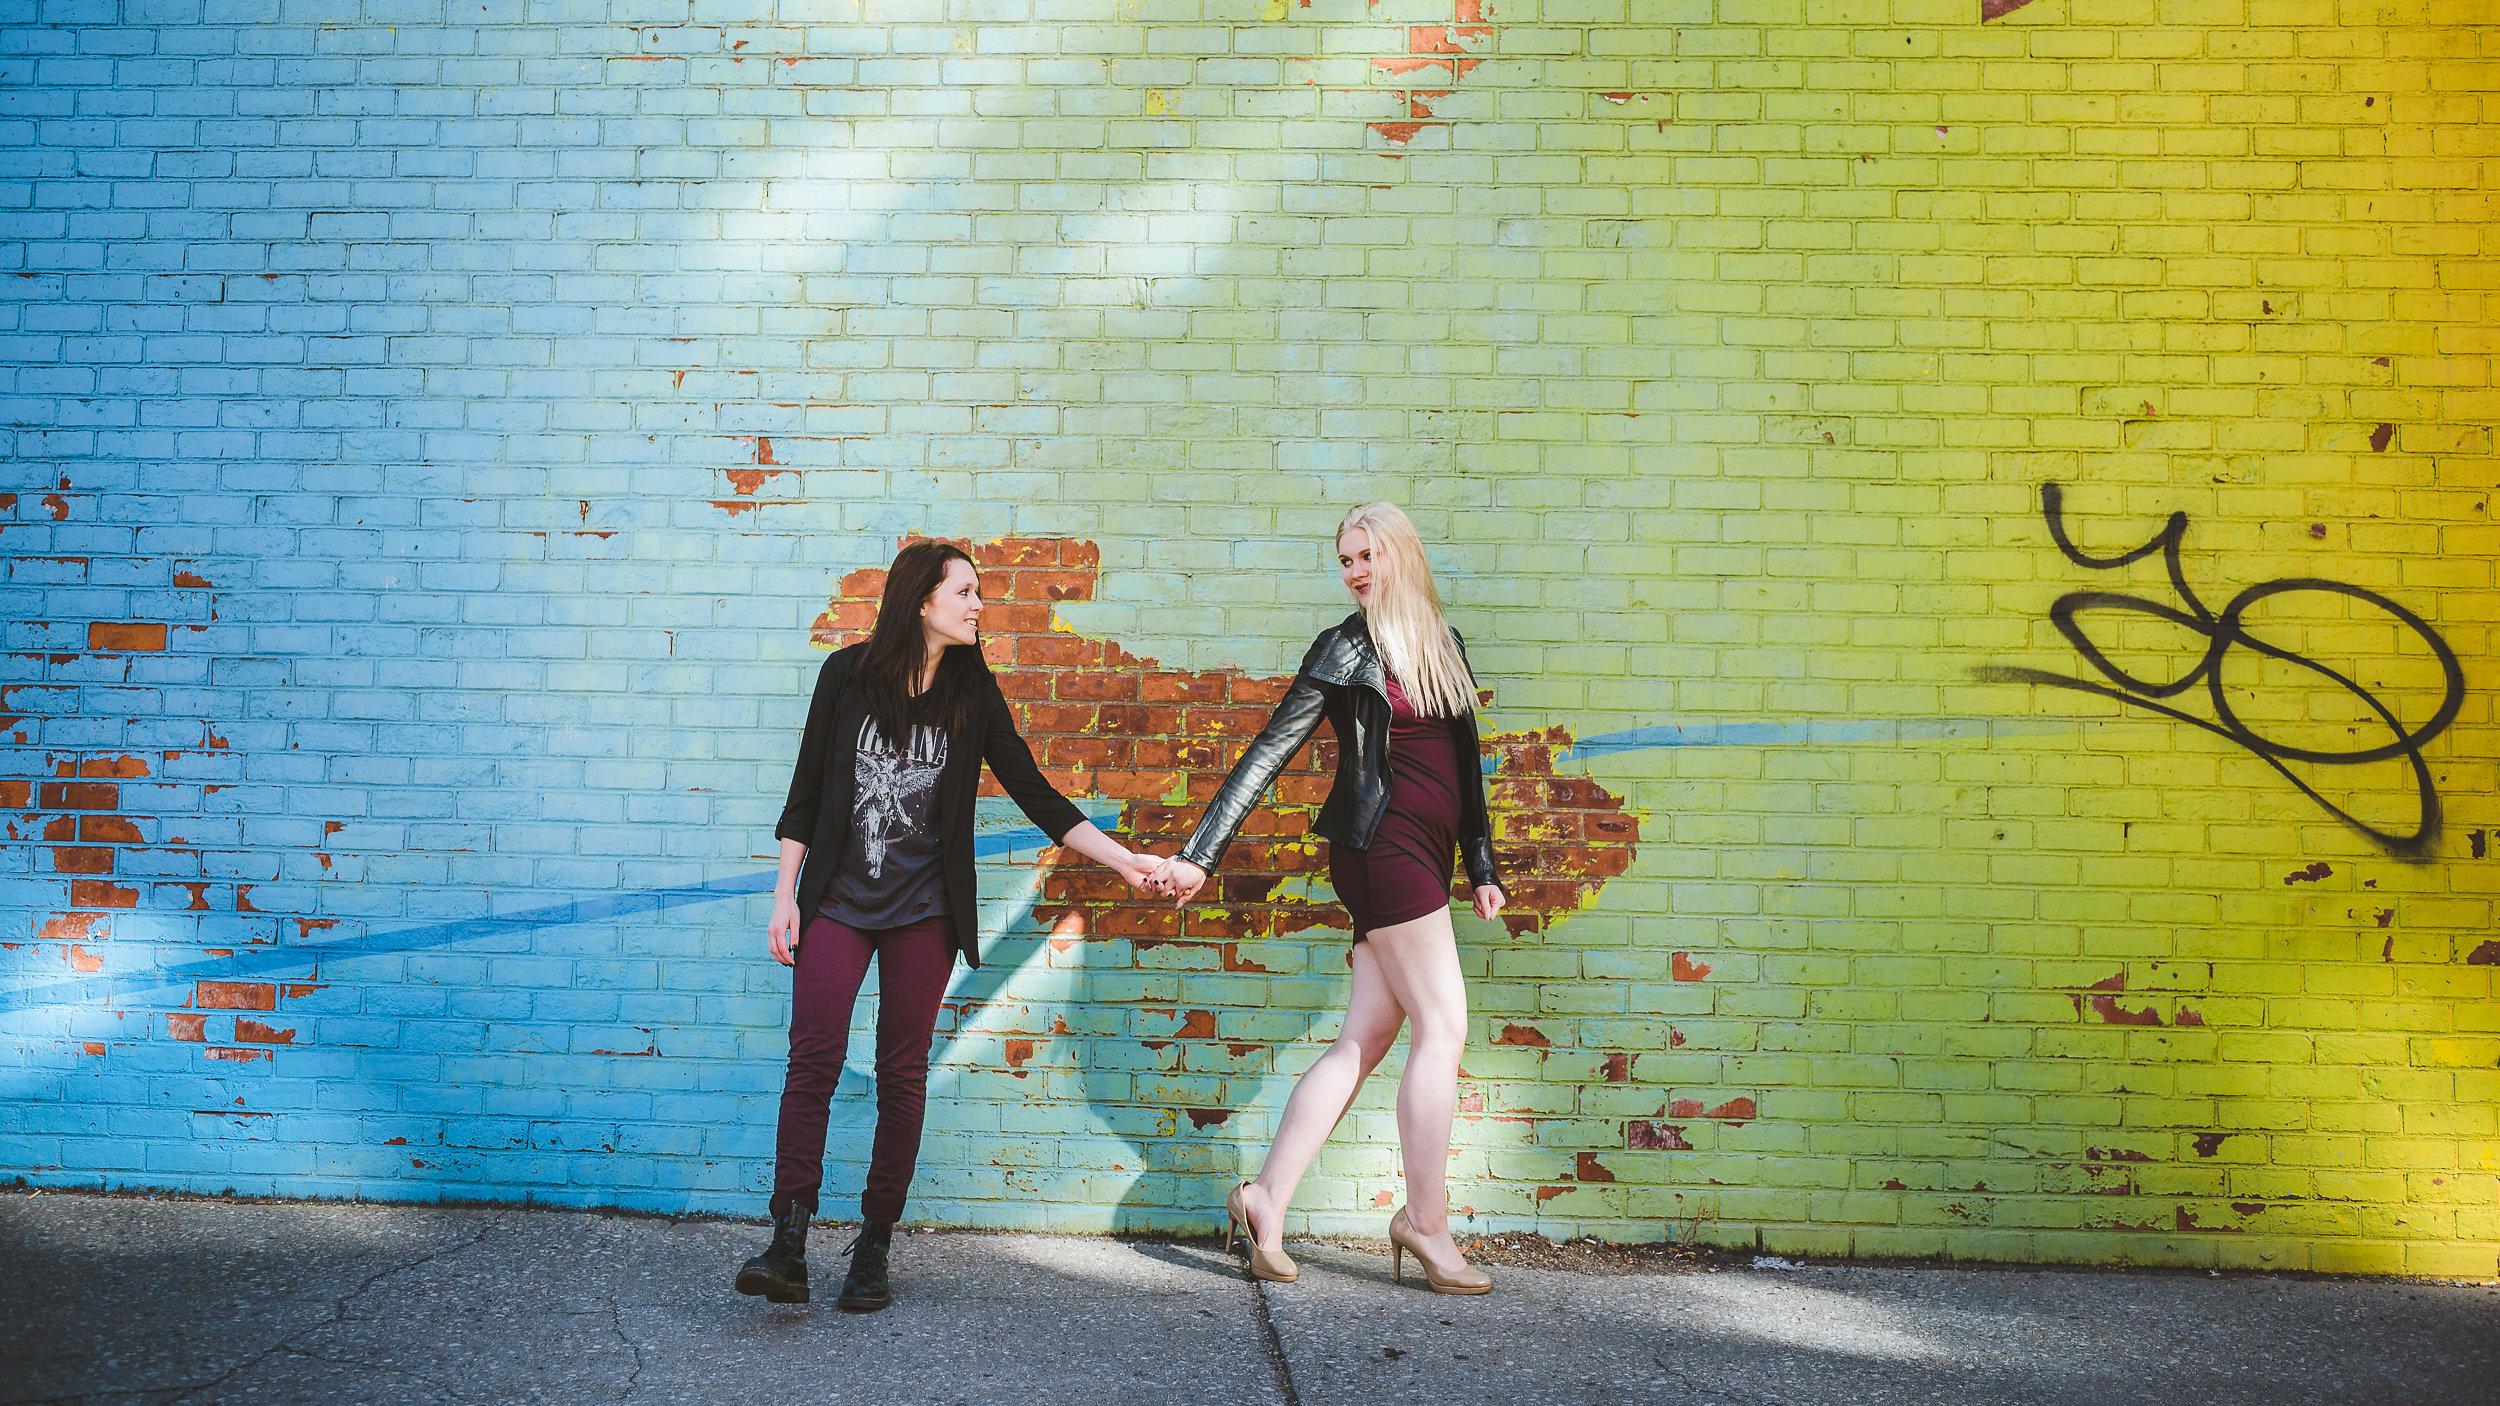 Alexa&Emily Dumbo NYC Couples Session (10).JPG